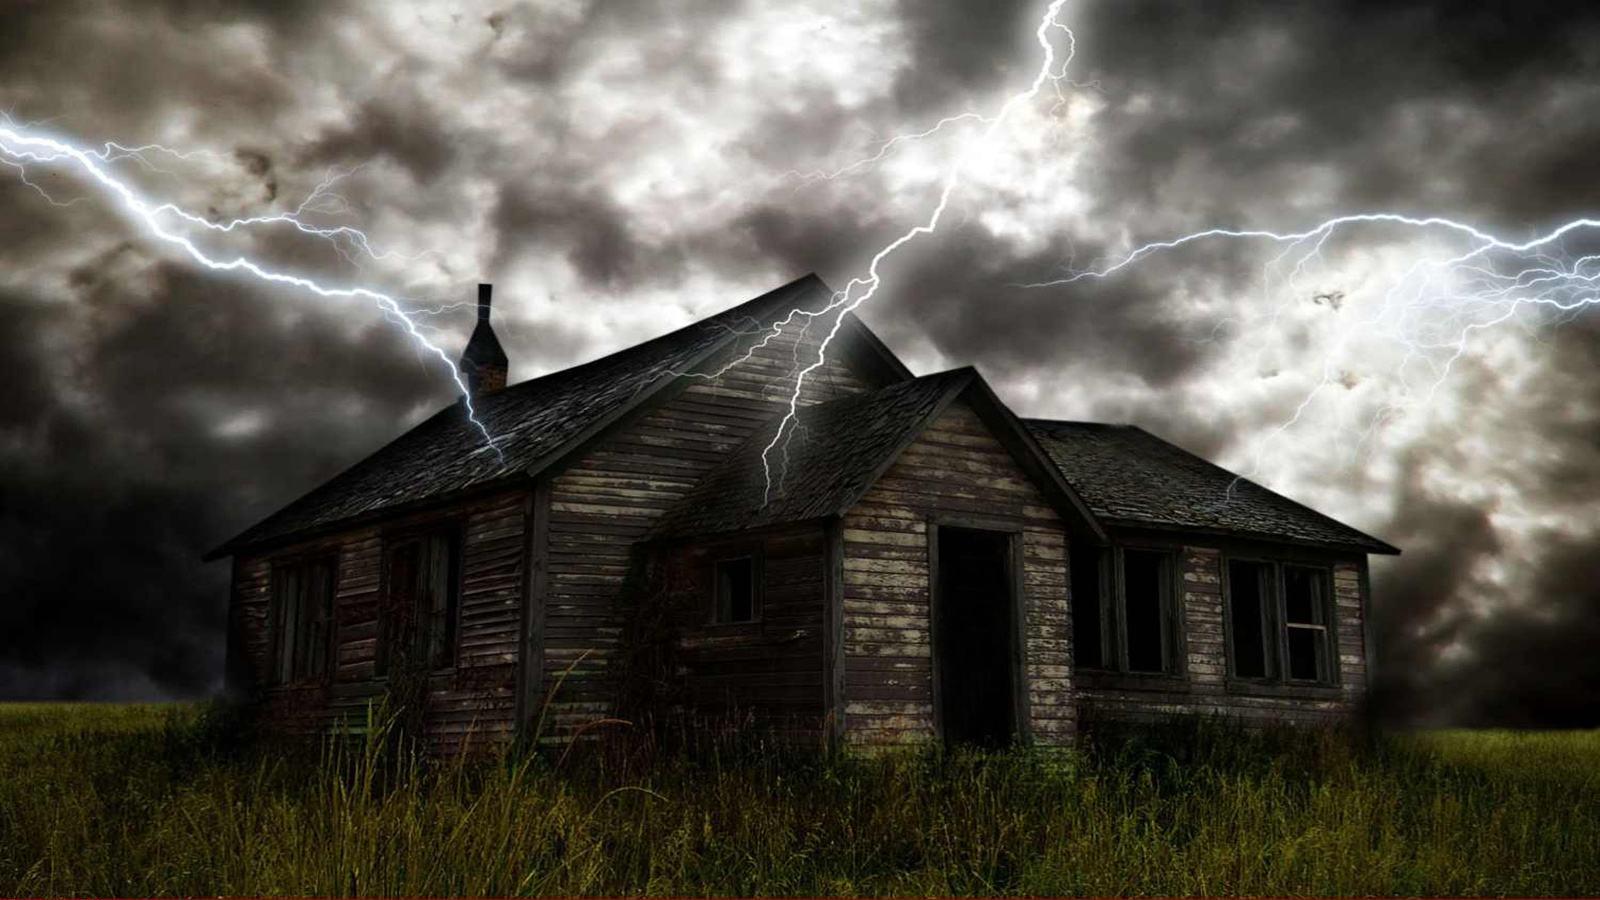 haunted house live wallpaper desktop wallpapersafari. Black Bedroom Furniture Sets. Home Design Ideas